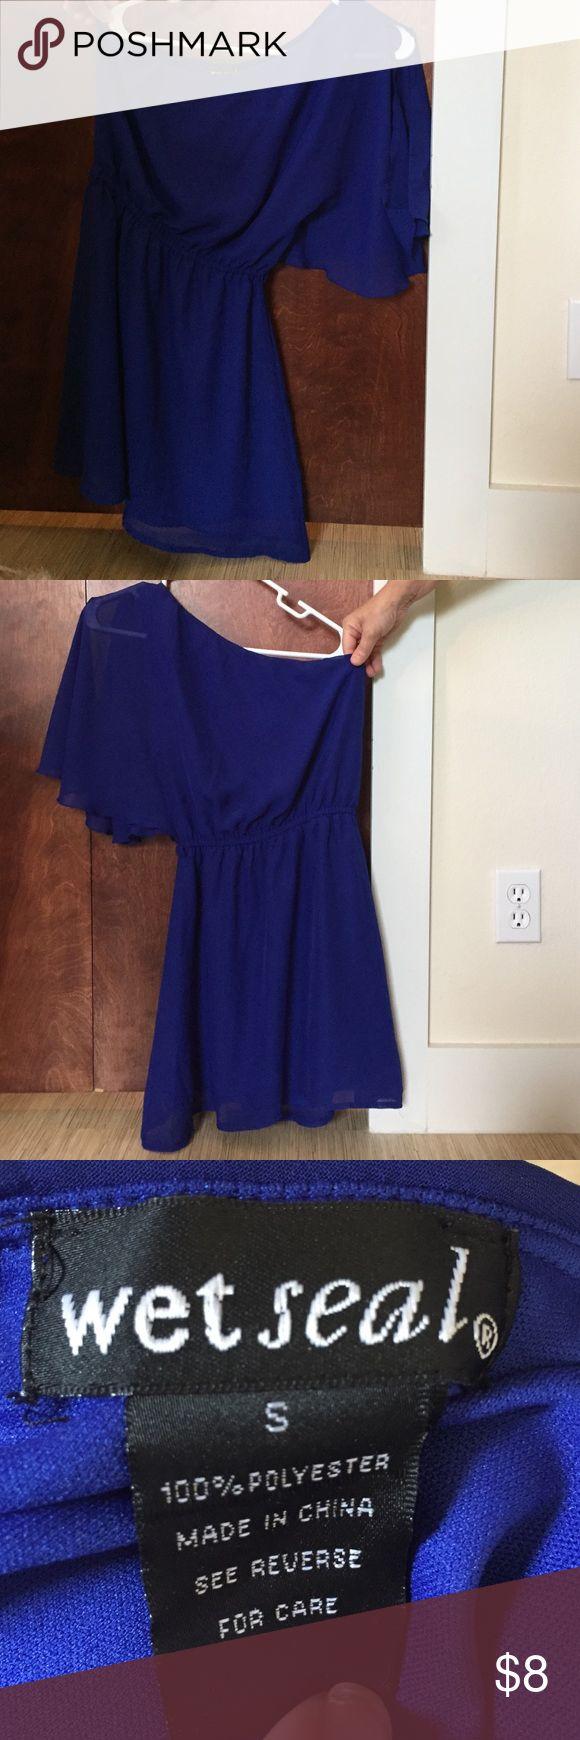 Royal Blue - One Strap Dress - Wet Seal Royal Blue - One Strap Dress - Wet Seal Wet Seal Dresses One Shoulder